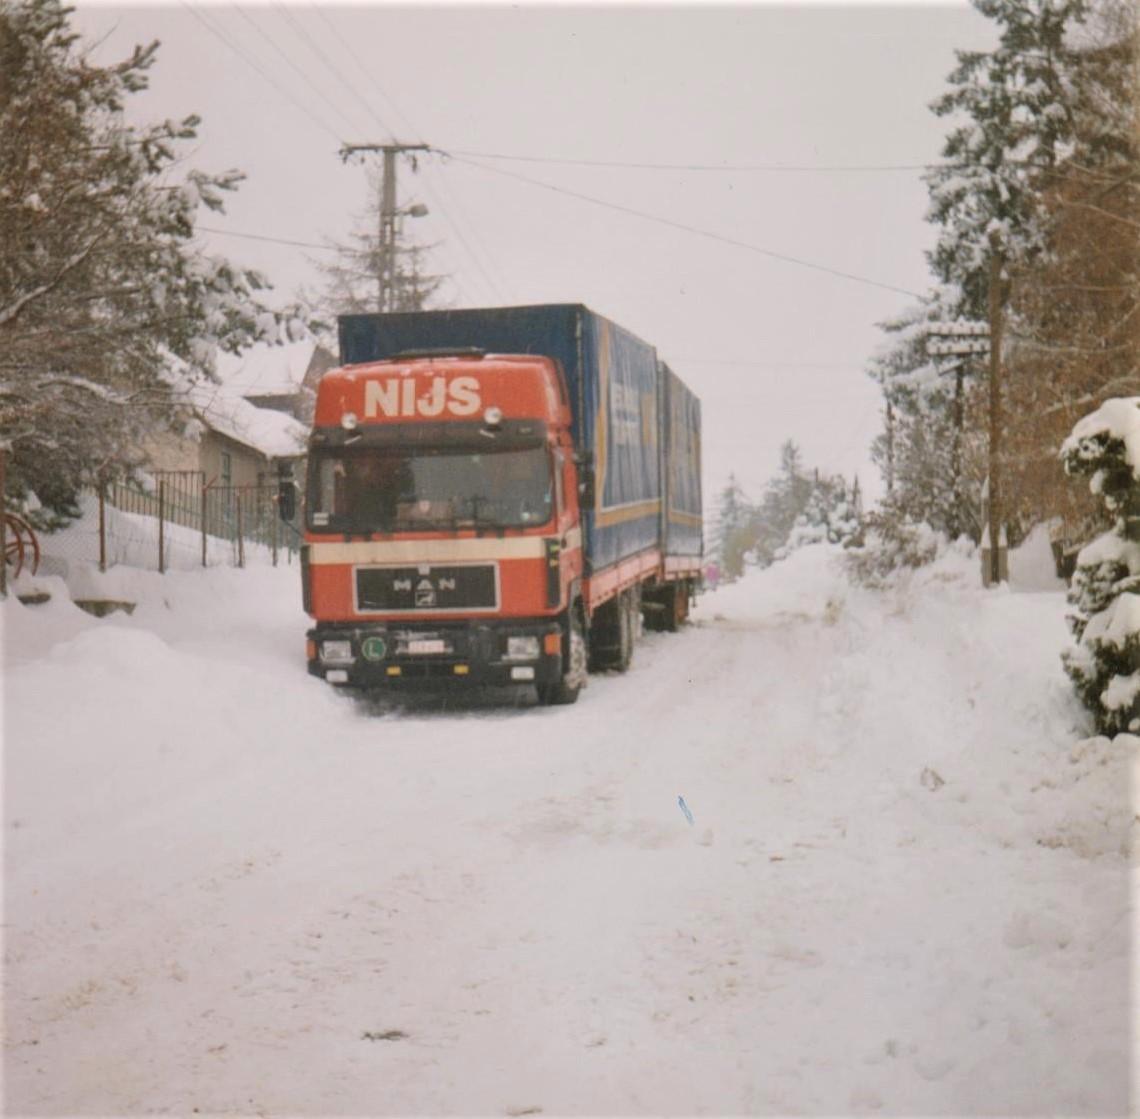 Winter-1990-1991-Fonyod--Hungaria--Peter-Bax-foto